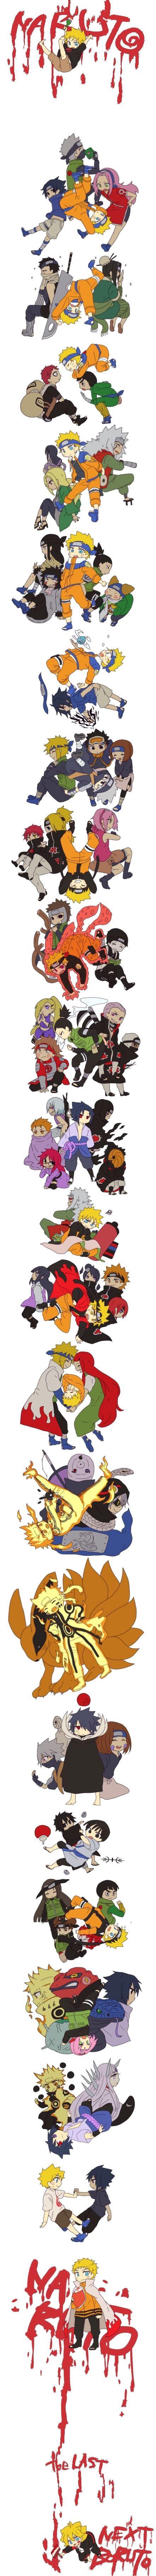 Photo of Full story of Naruto